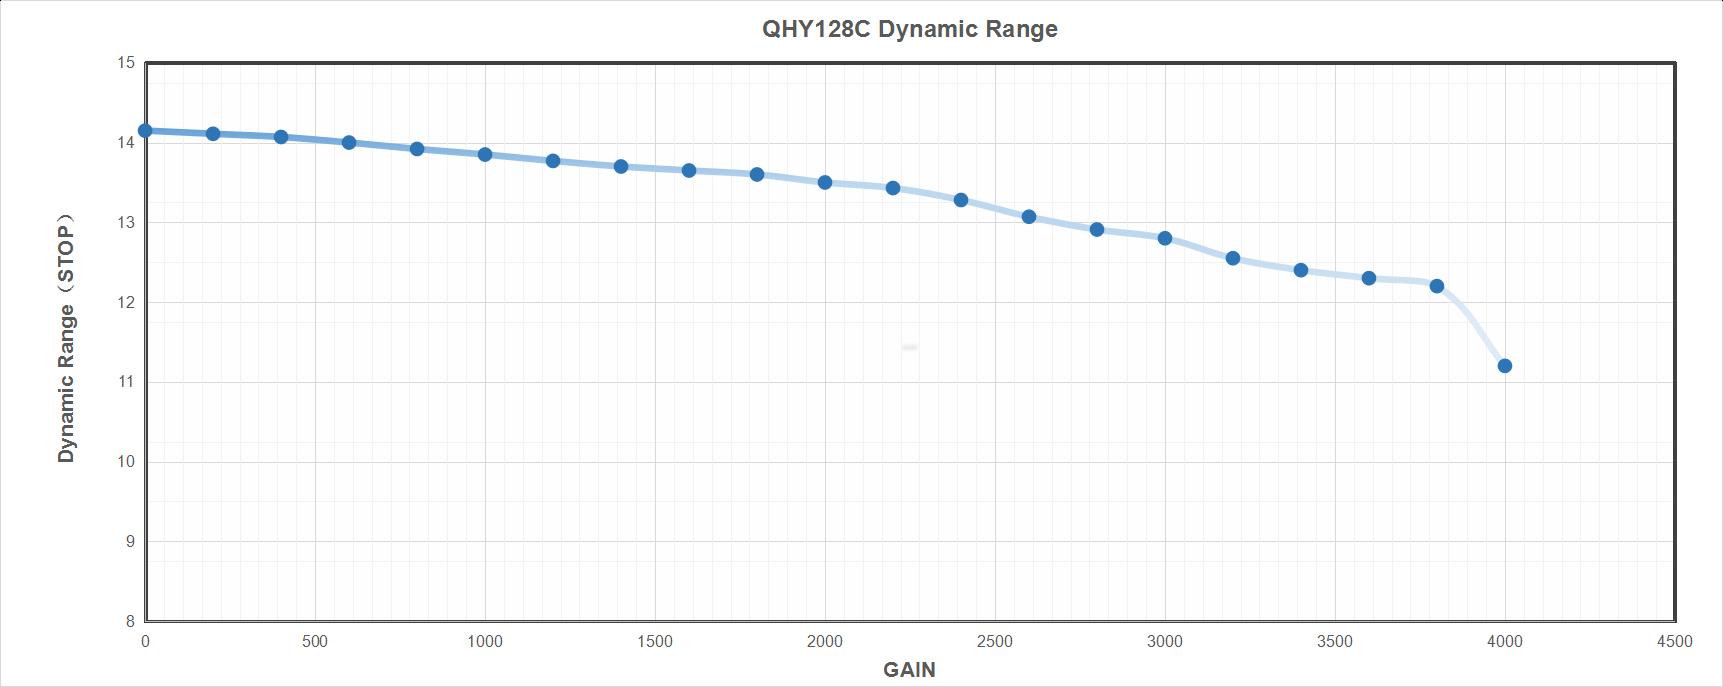 QHY 128C Dynamic Range